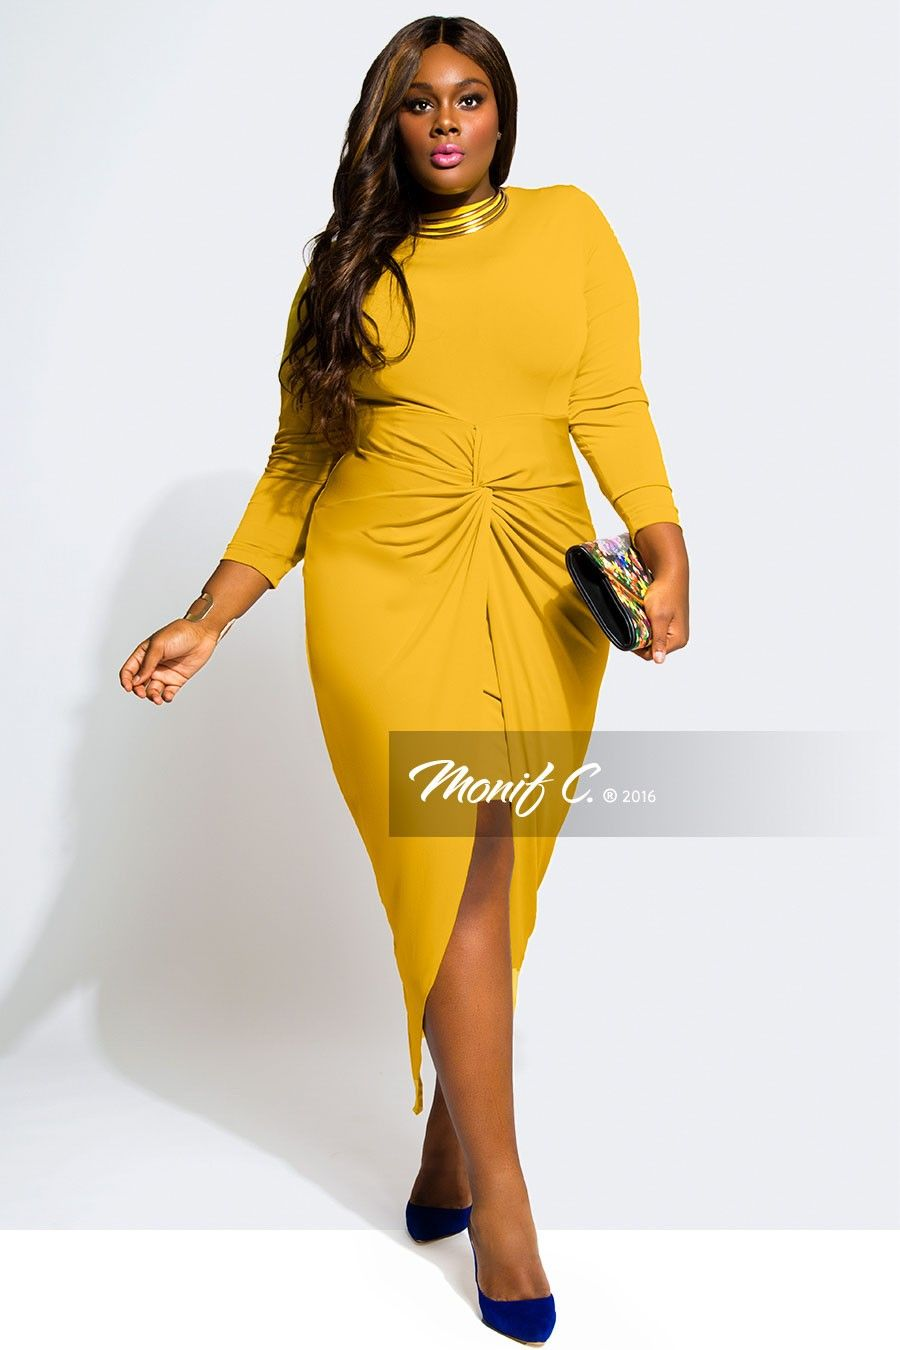 Mustard yellow dress for girls.